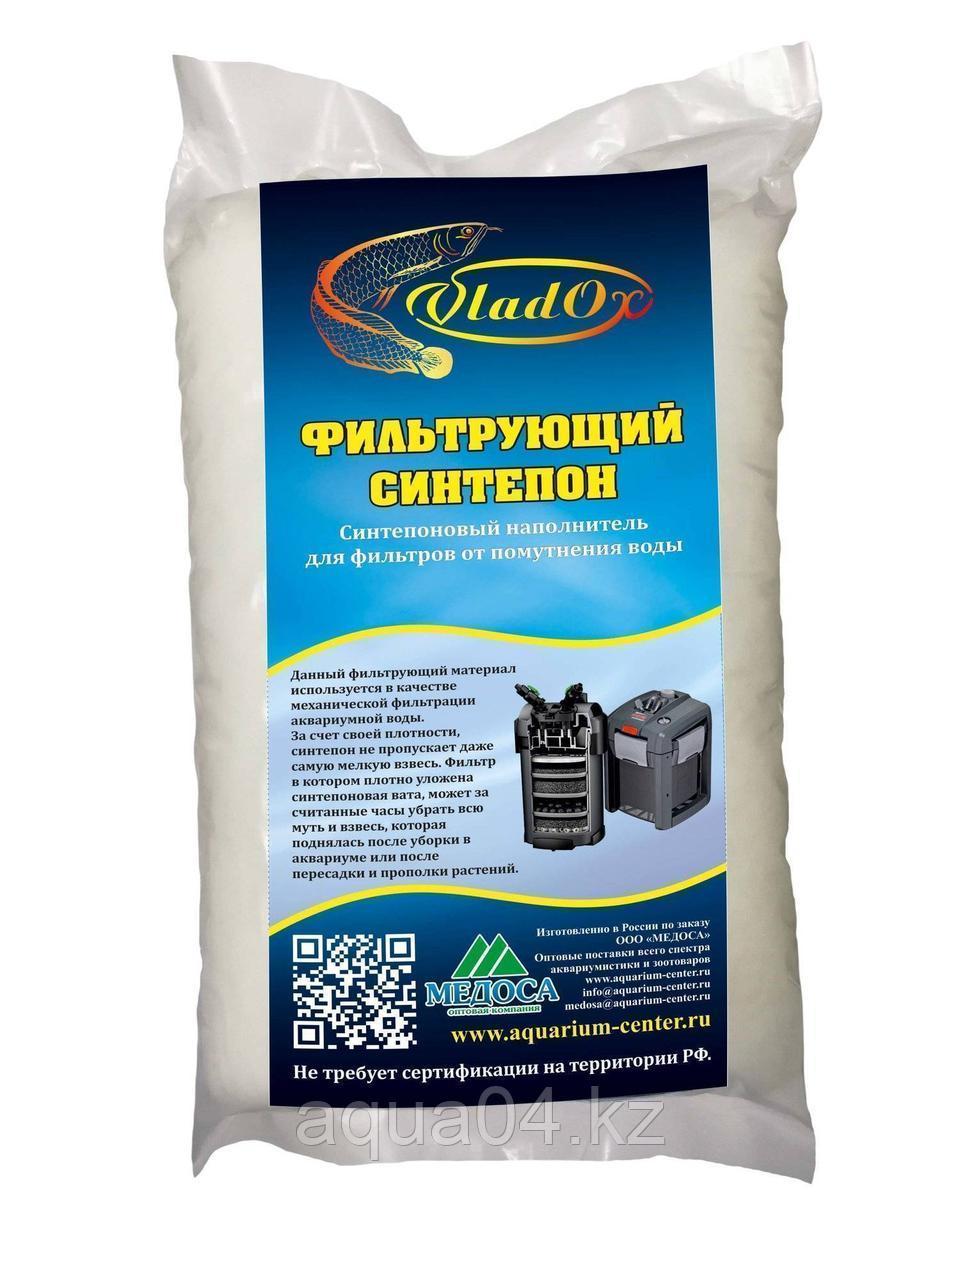 VladOx Фильтрующий синтепон 100 гр